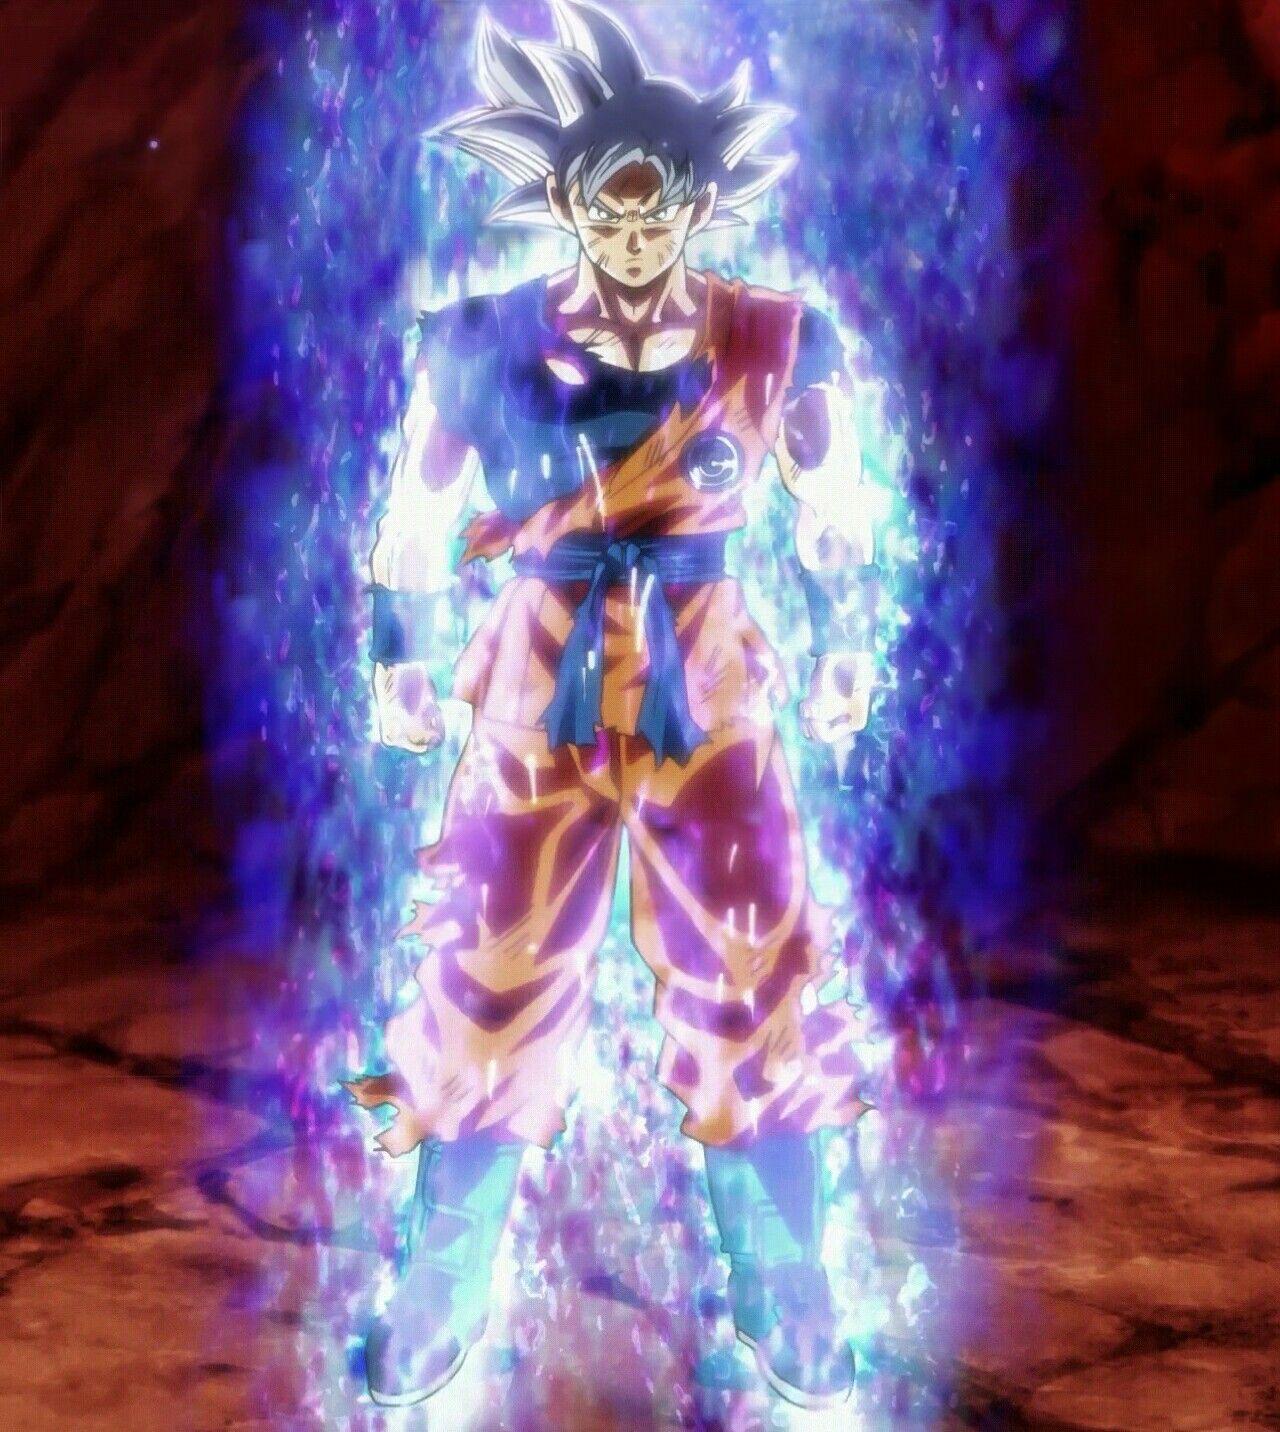 Migatte No Gokui Goku W Edited By Me Anime Dragon Ball Super Dragon Ball Super Goku Dragon Ball